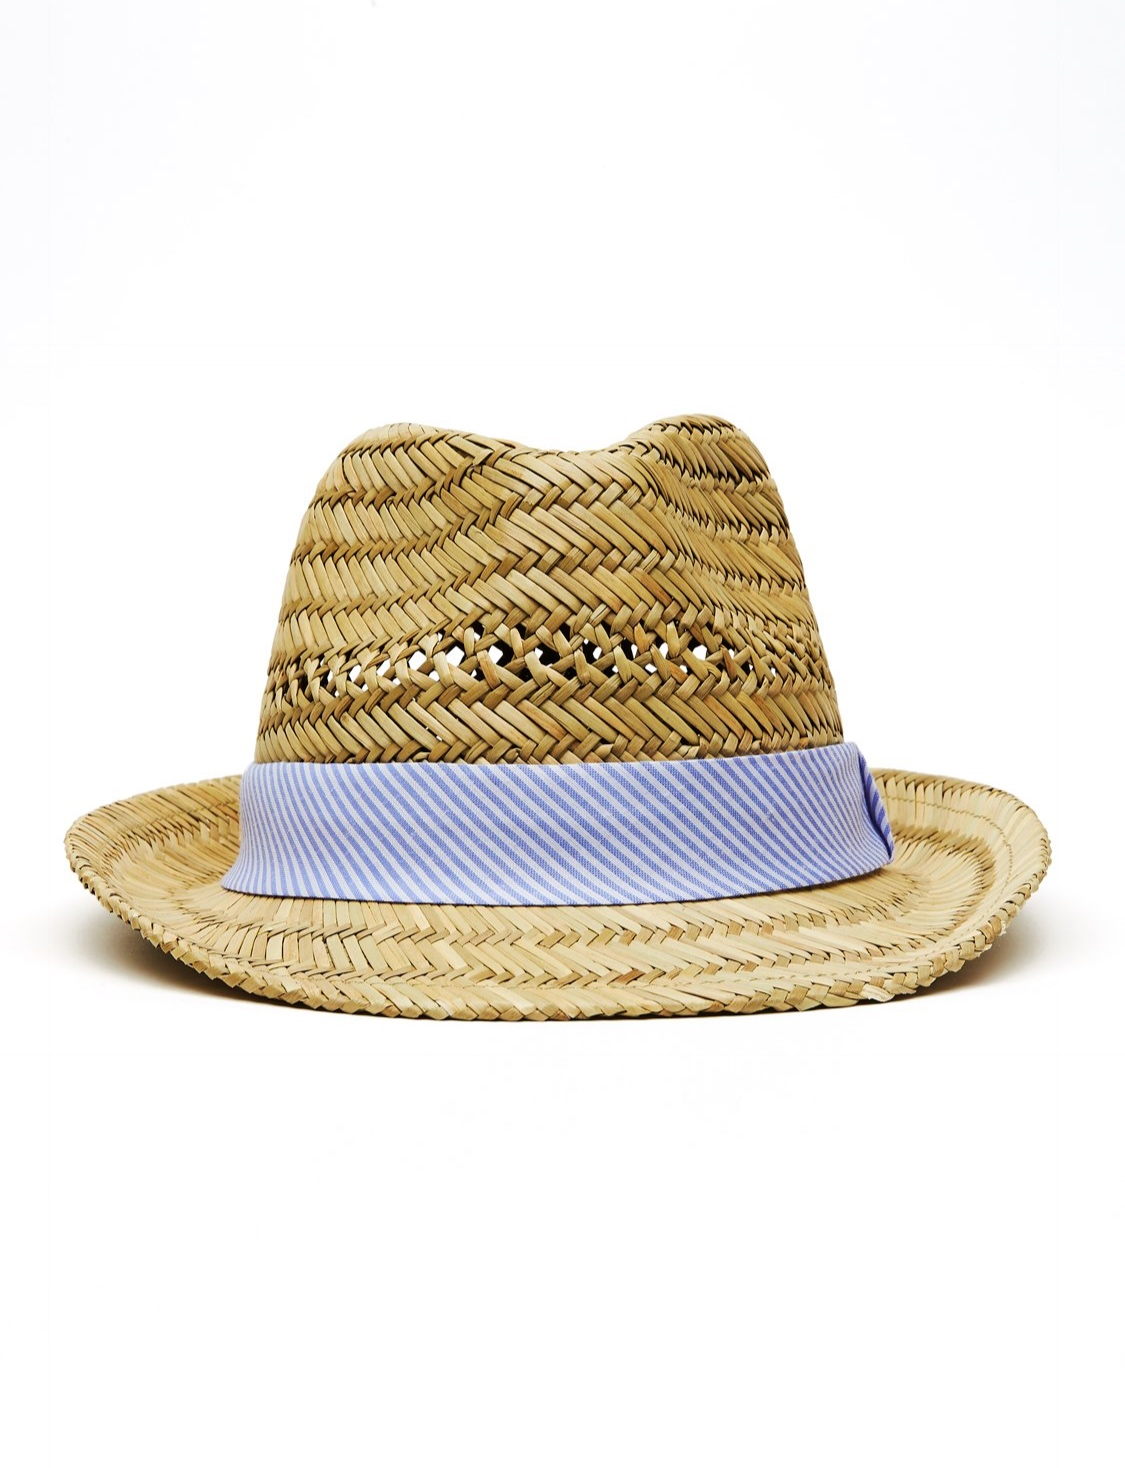 Open Panama Straw Hat